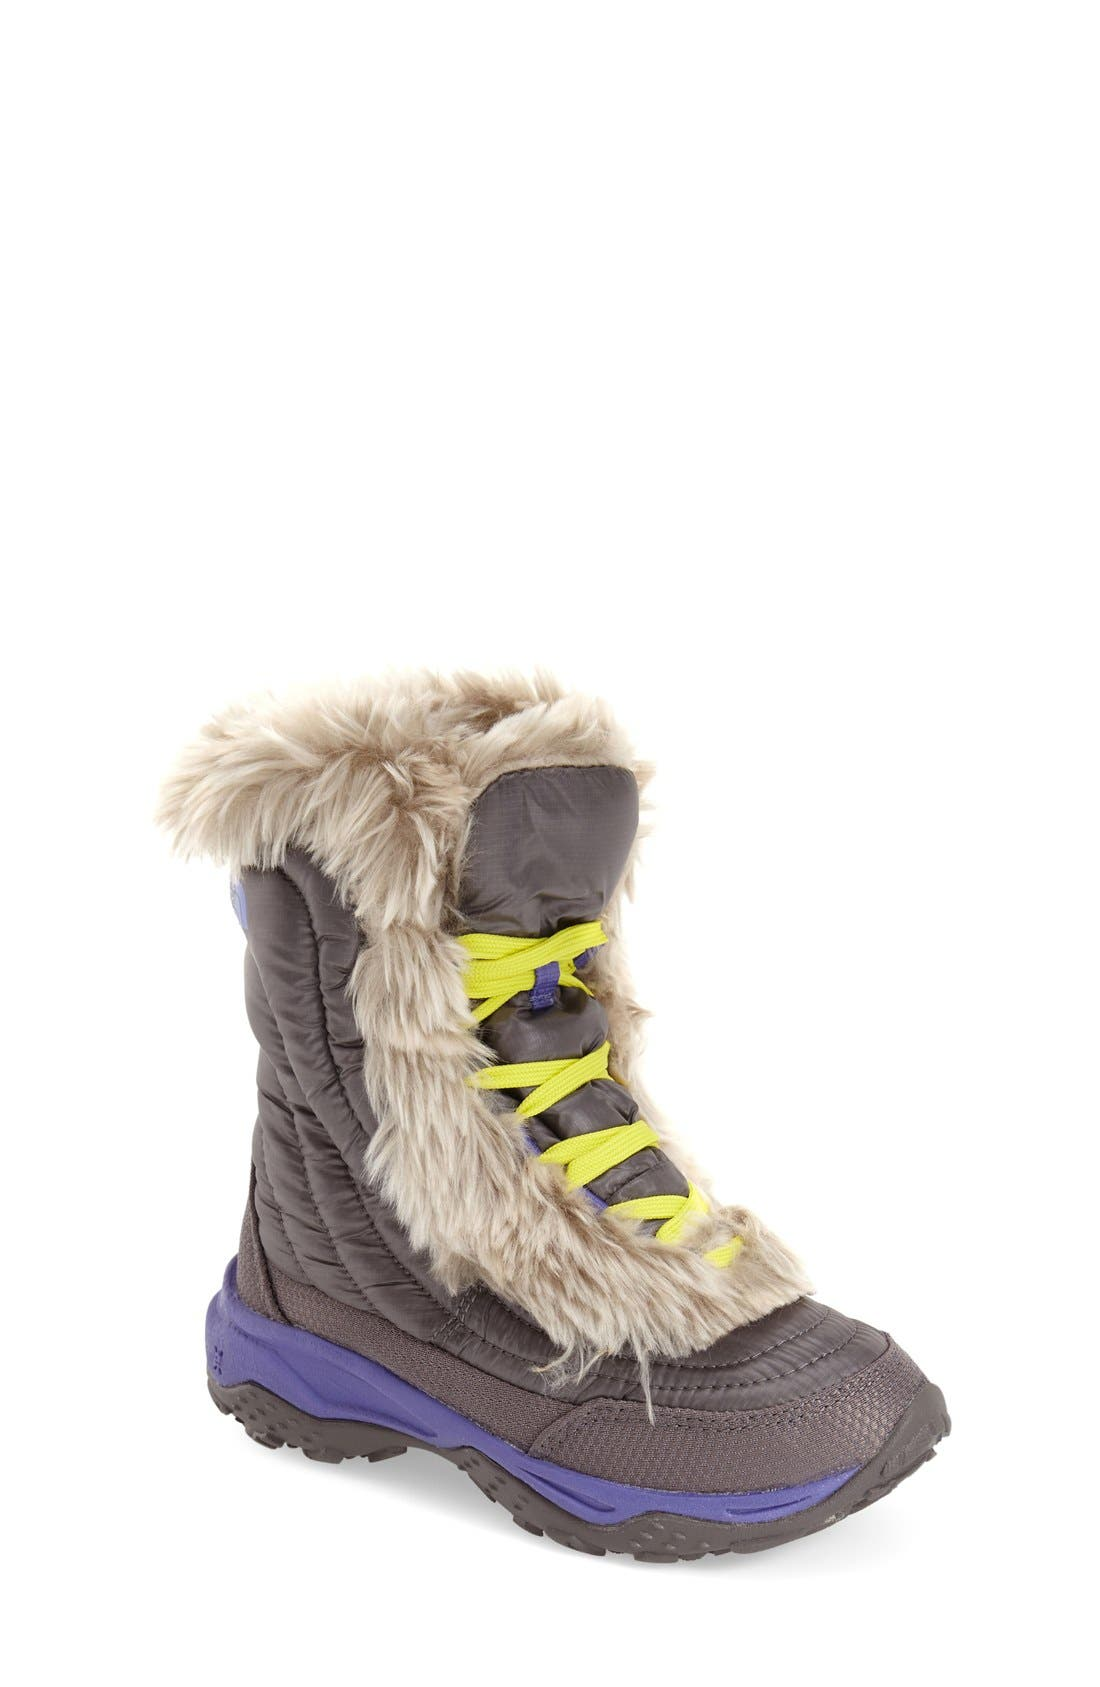 Main Image - The North Face 'Nuptse Fur' Boot (Little Kid & Big Kid)